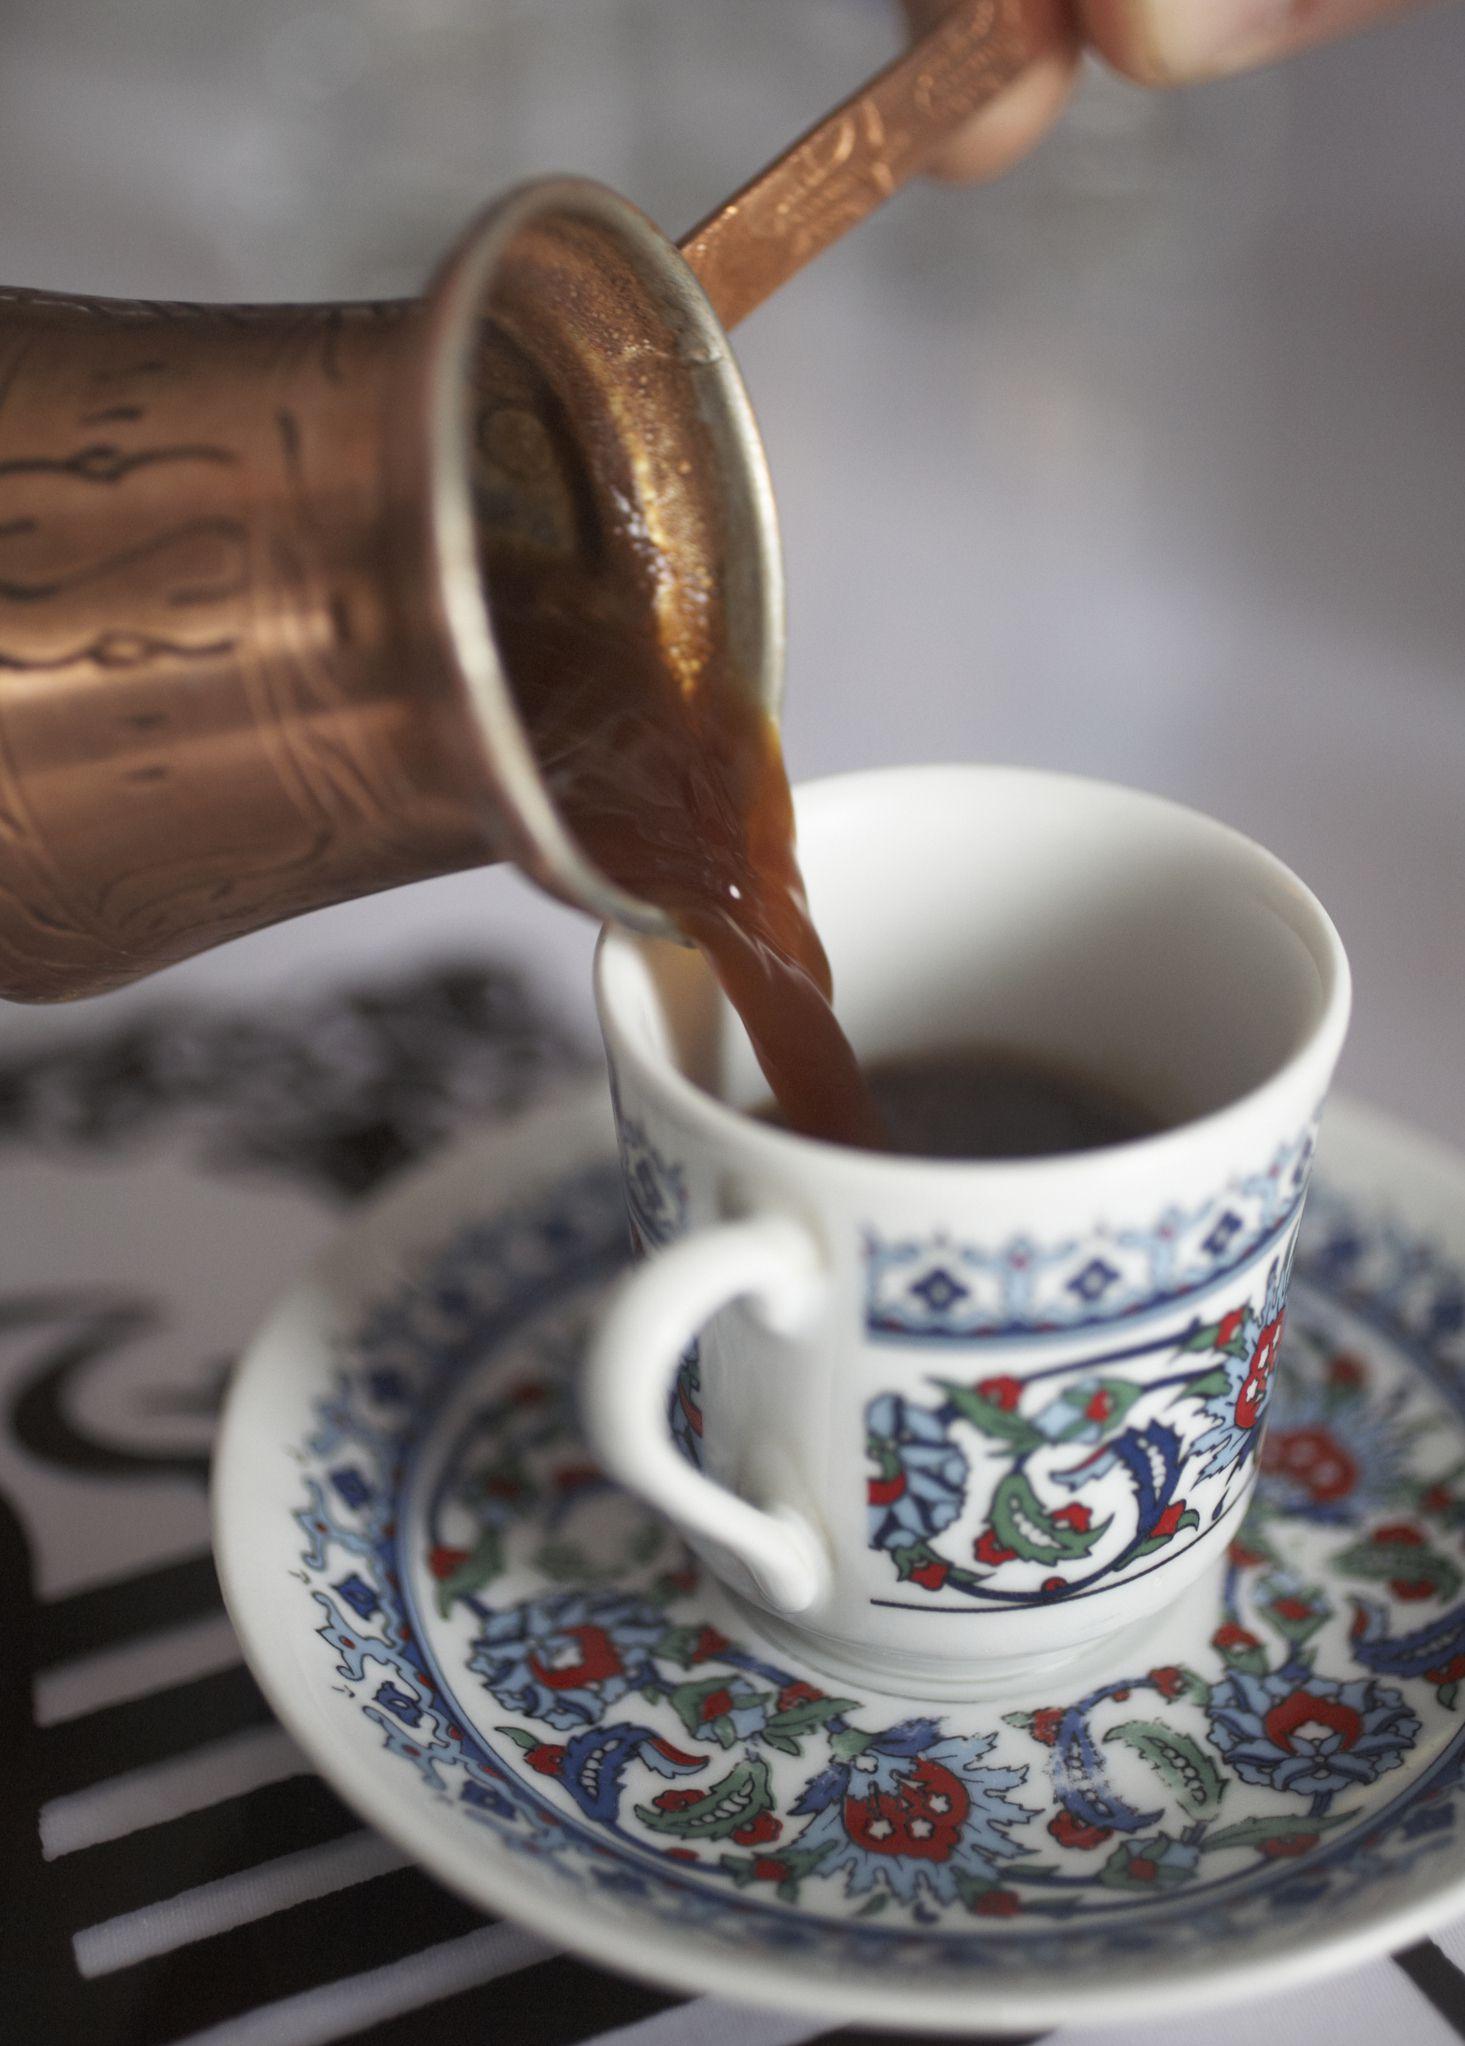 Recipe For Turkish Coffee Or Turska Kafa